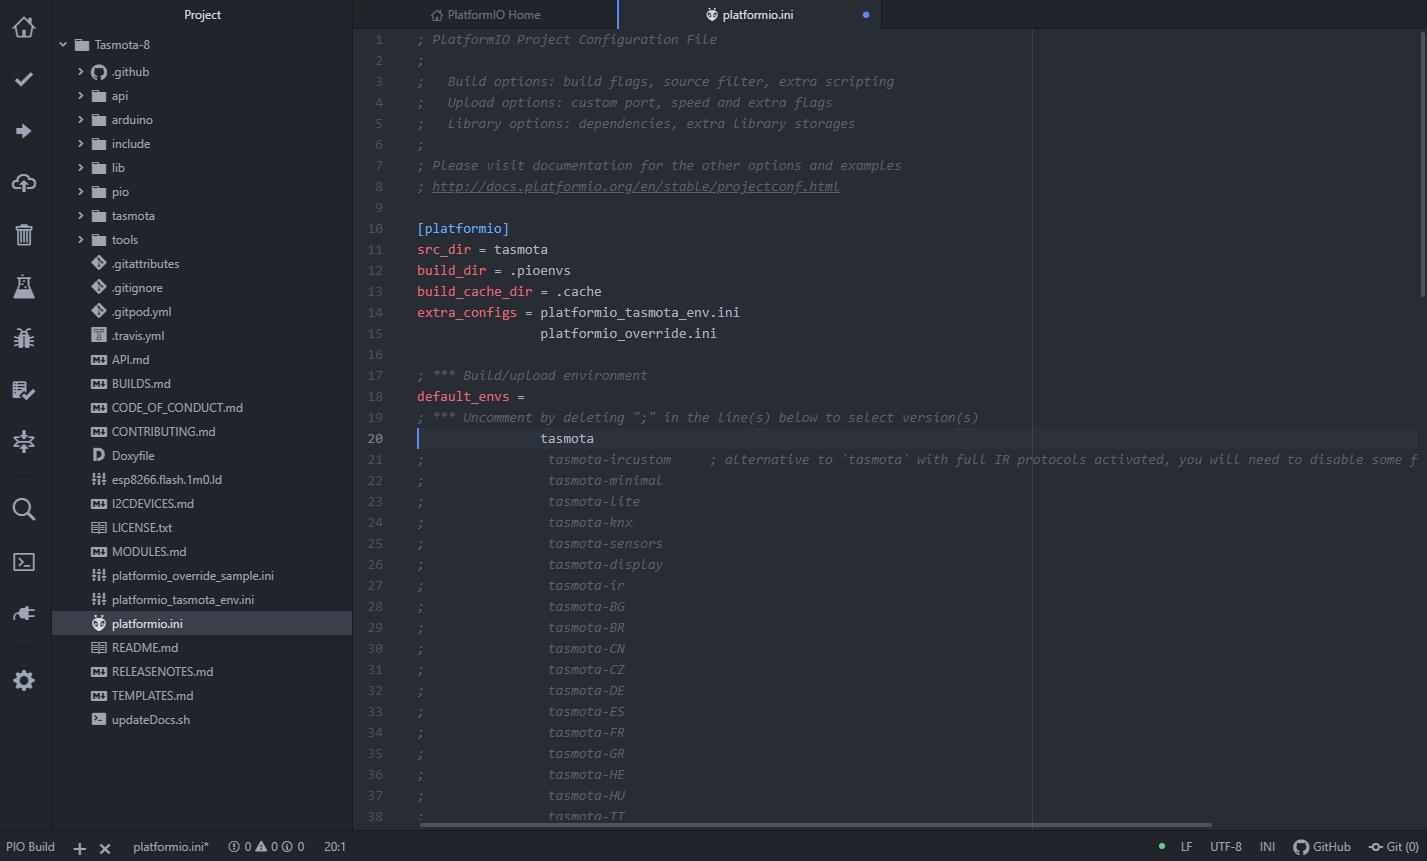 Atom - platform.io